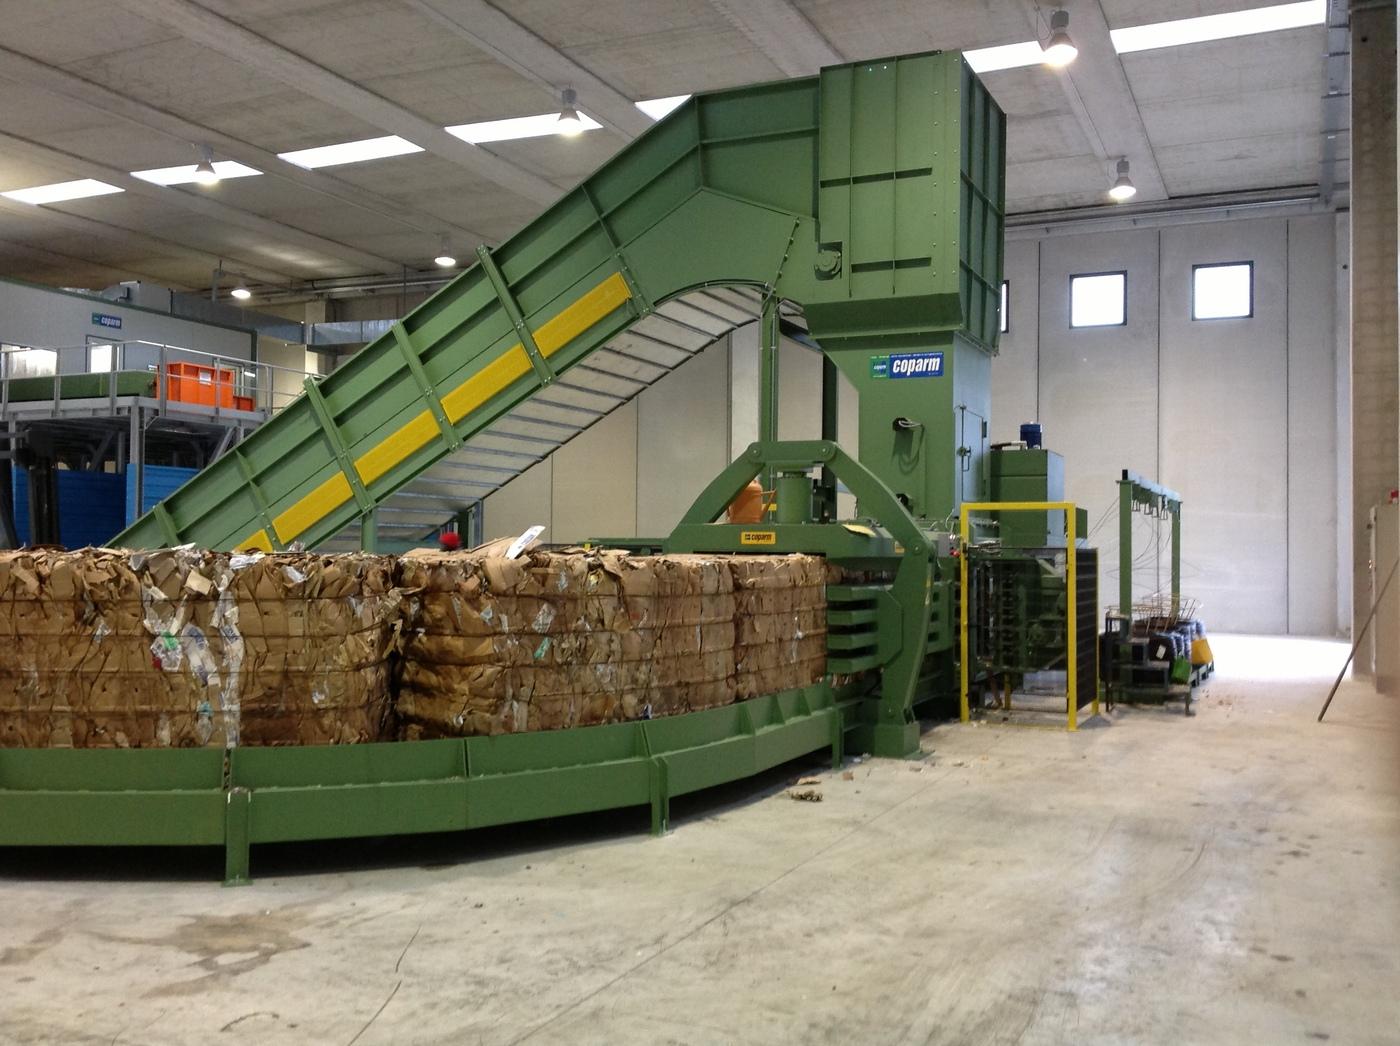 Prensas industriales prensas para residuos prensas para for Presse idrauliche usate per officina